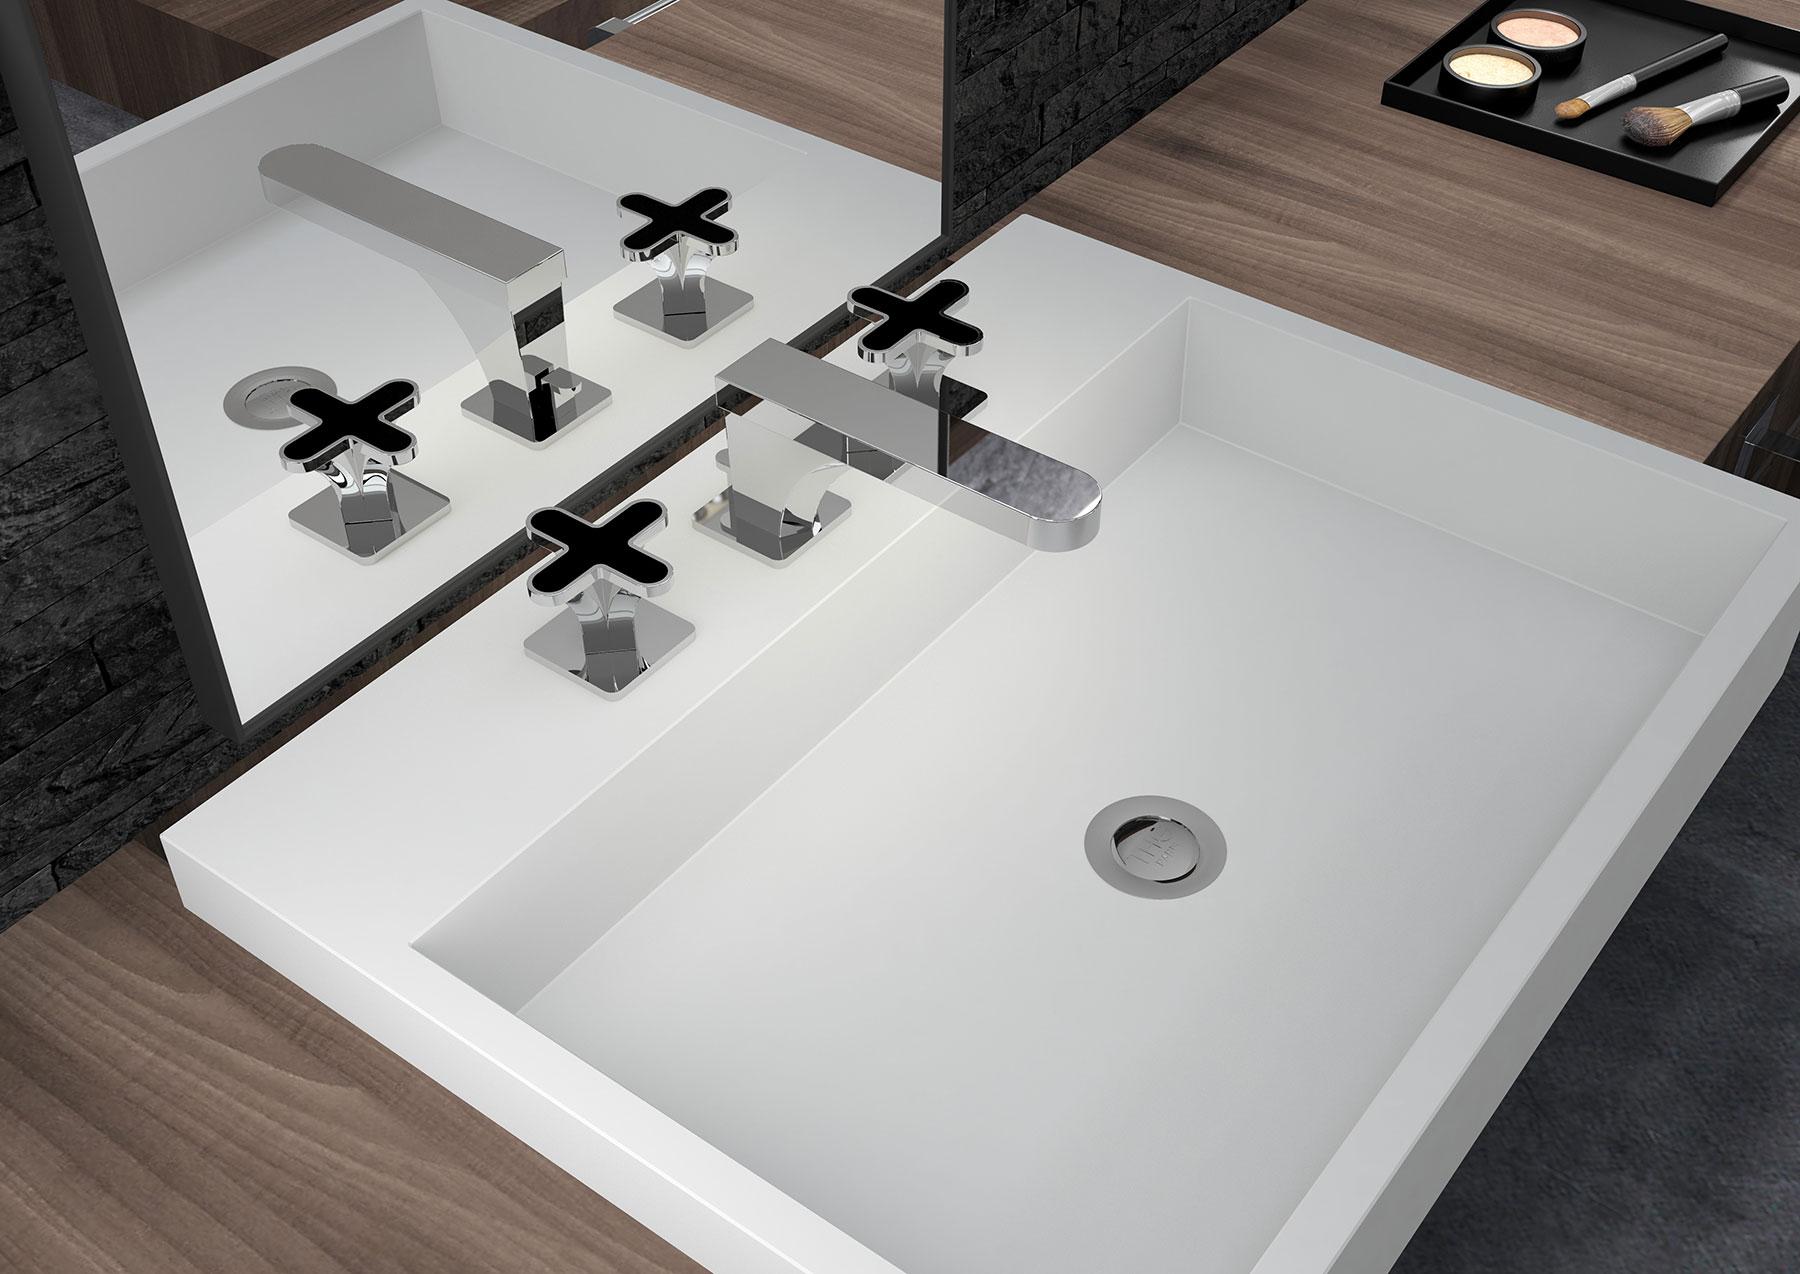 Modern Profil Deck Mount Faucet